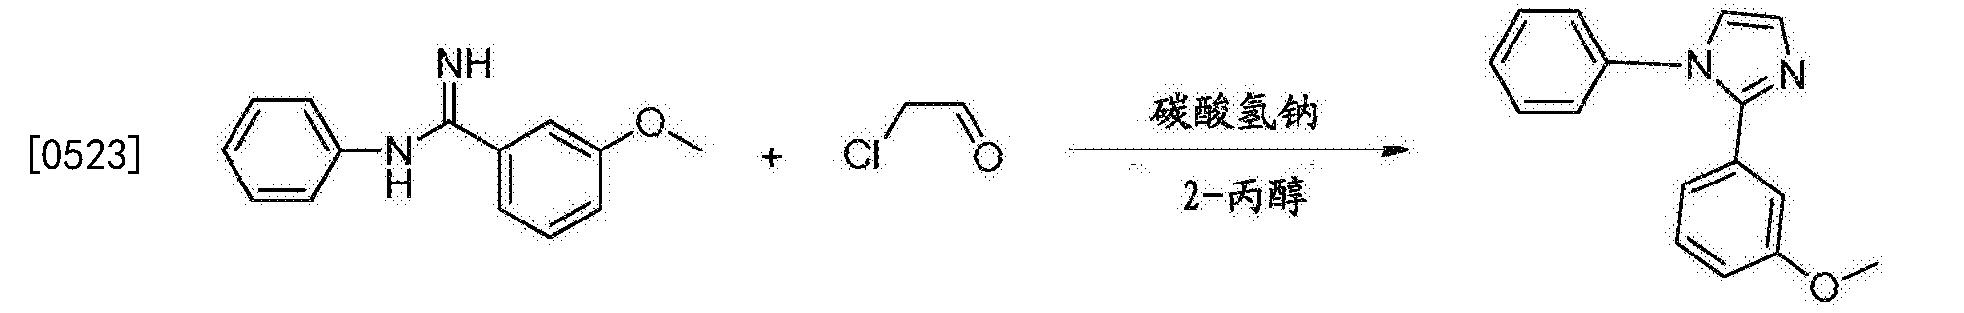 Figure CN106749425AD01553